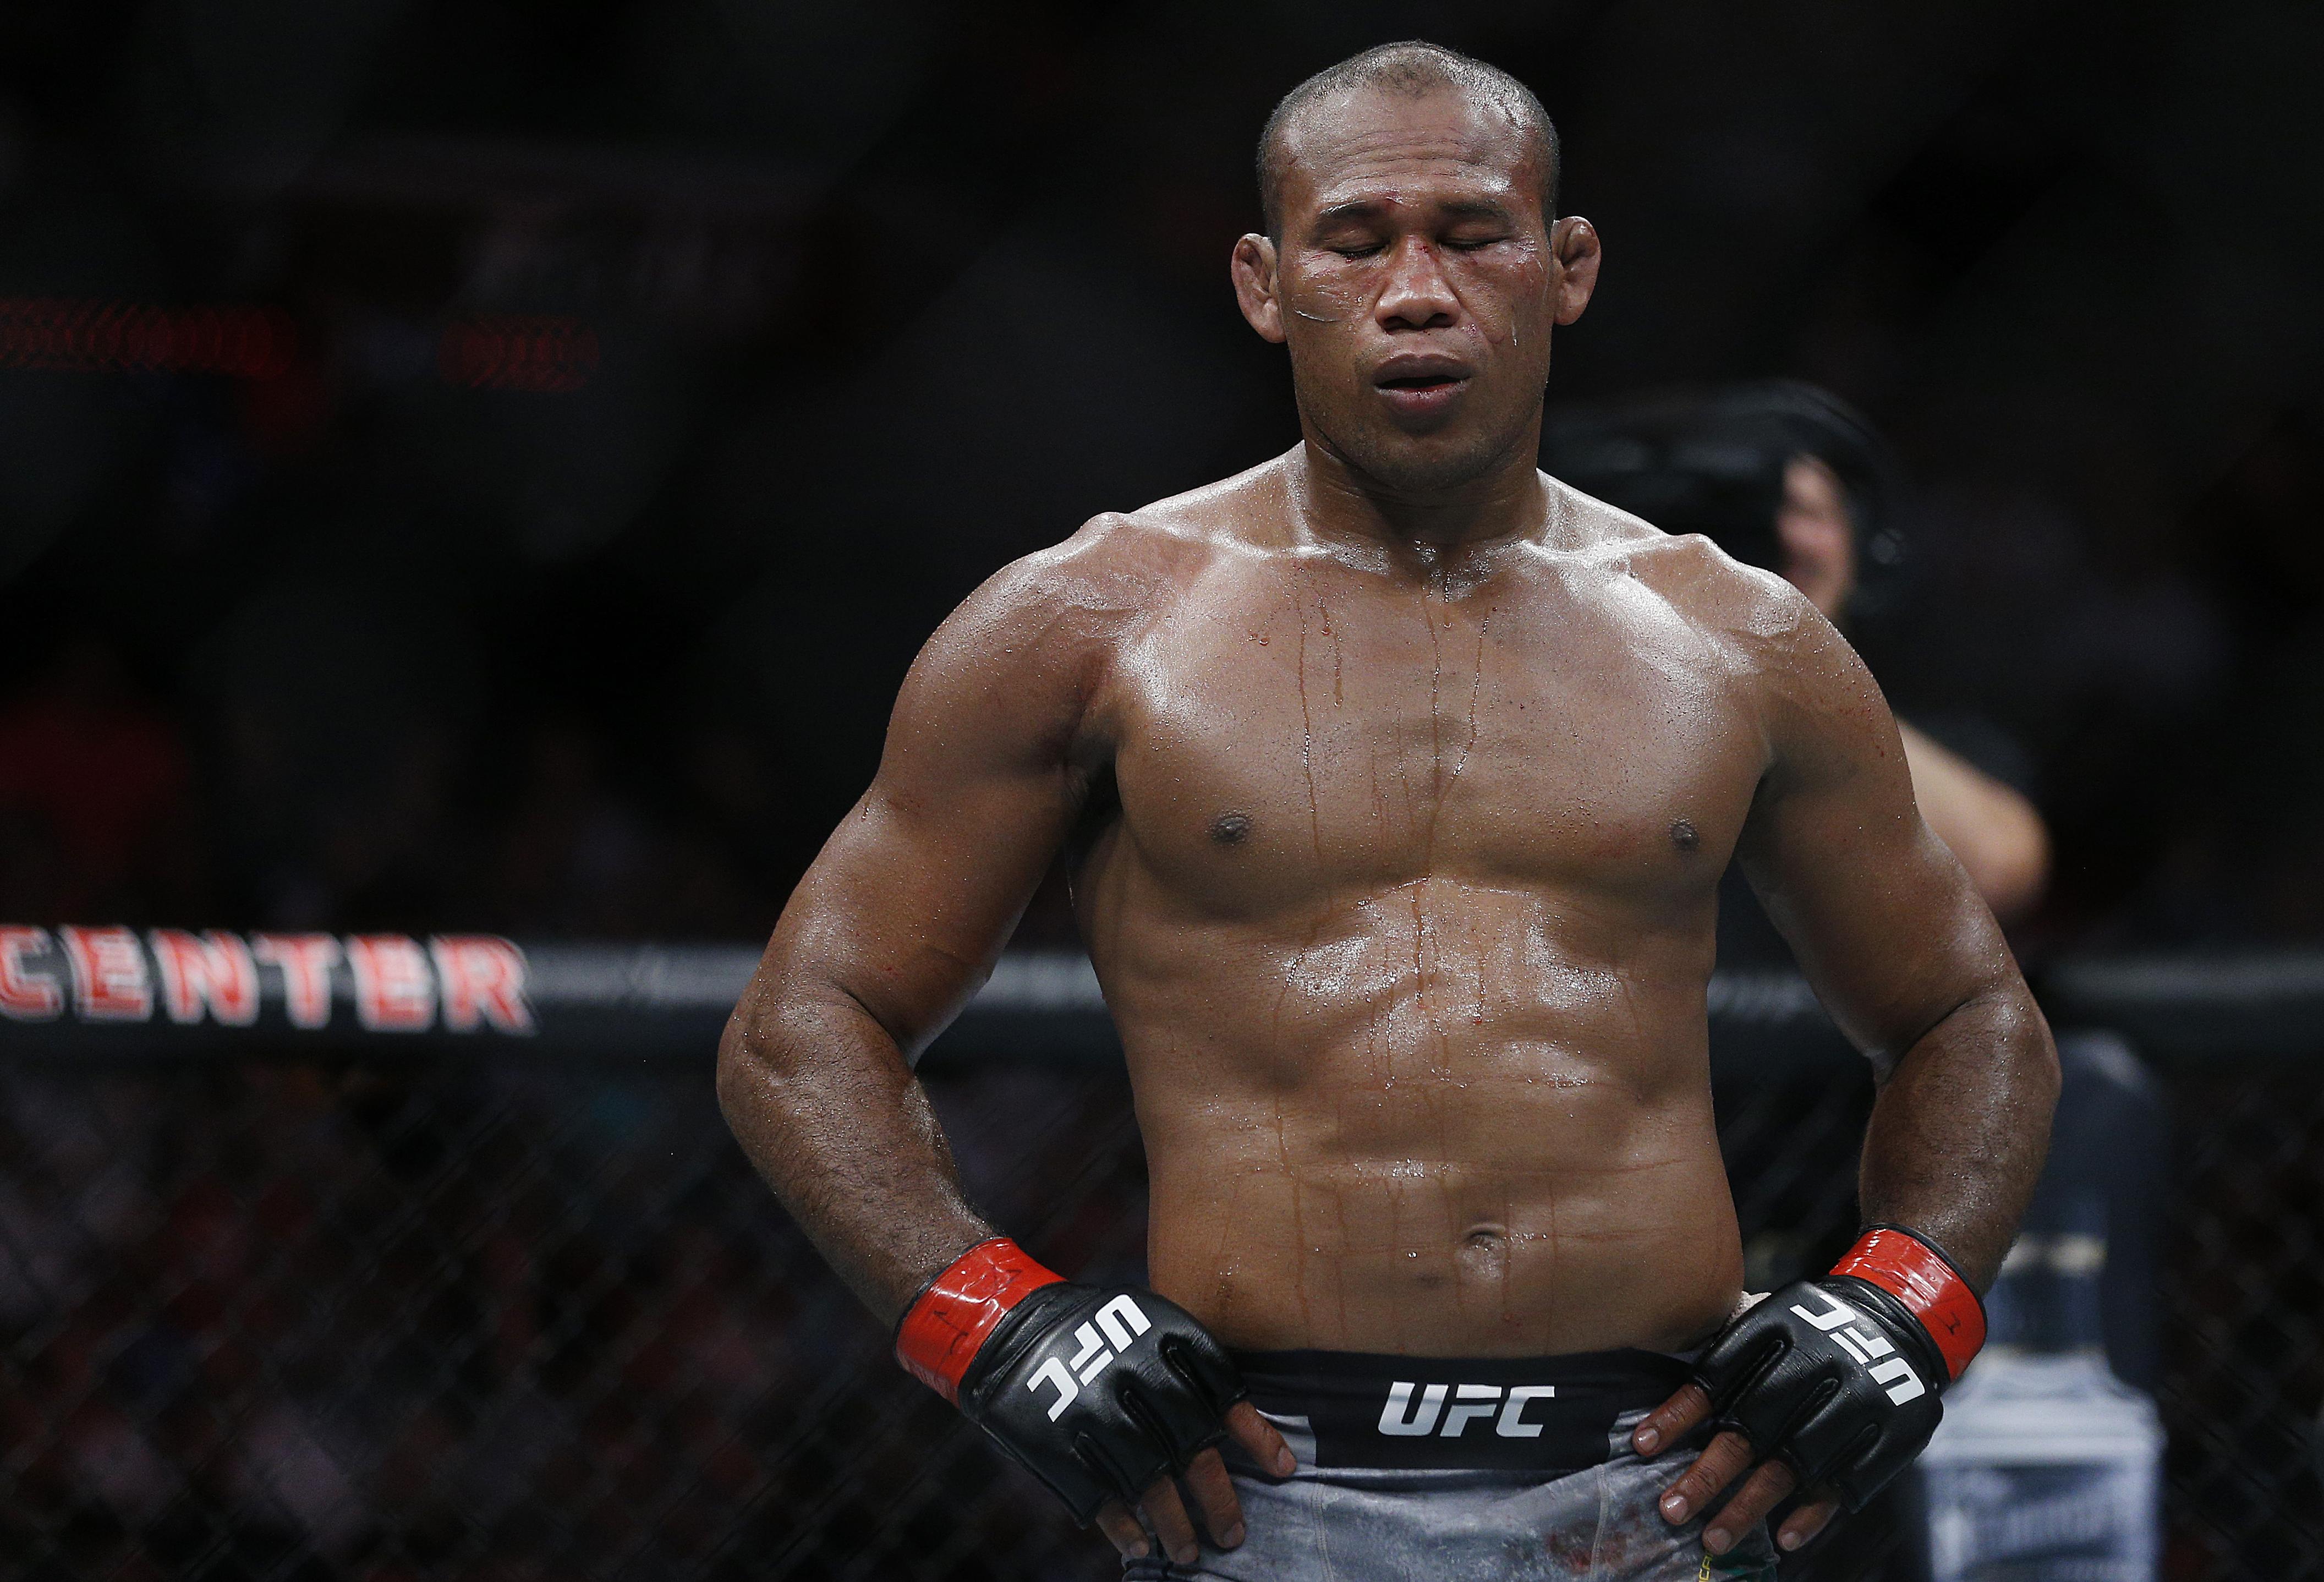 Ronaldo Souza retired from MMA at 41.